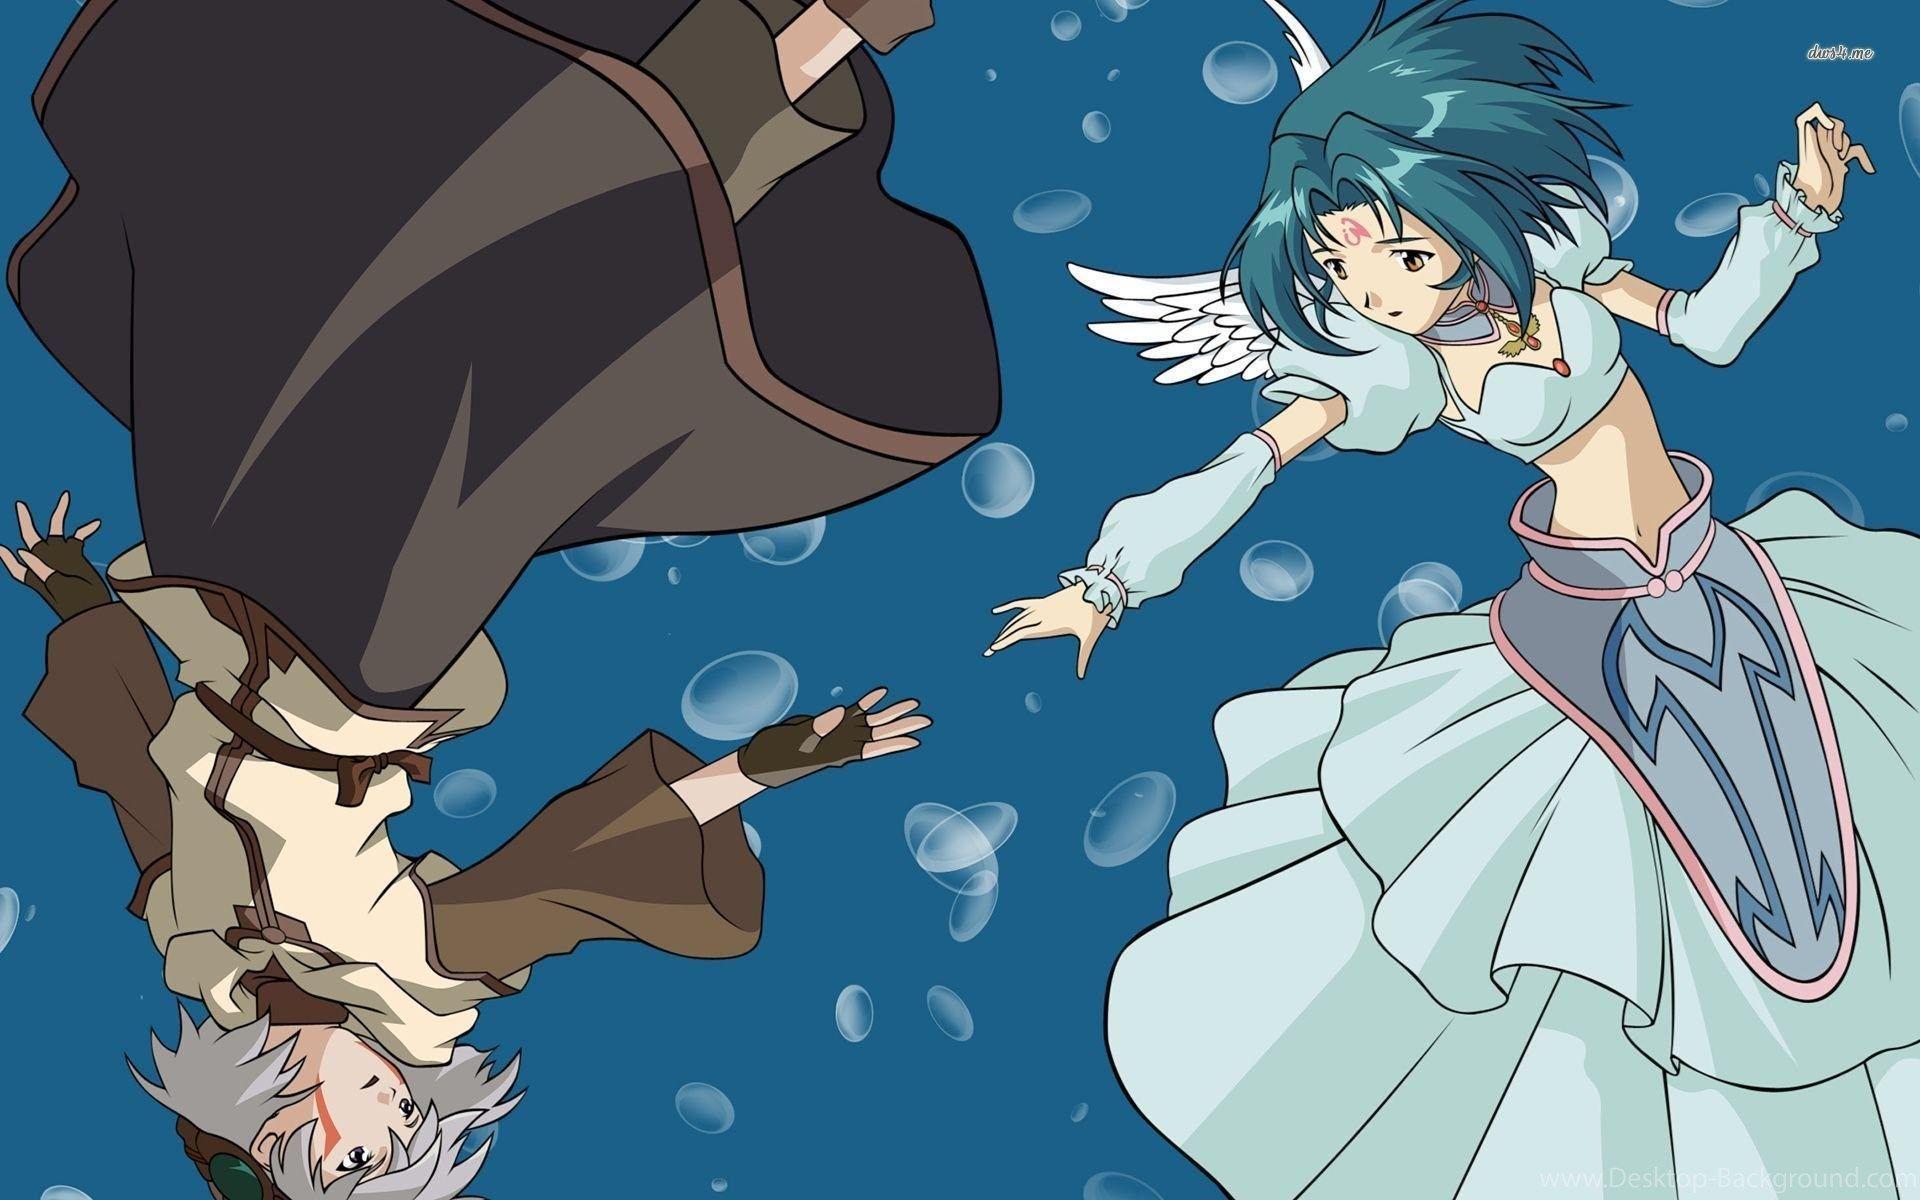 Anime Subaru Wallpapers Top Free Anime Subaru Backgrounds